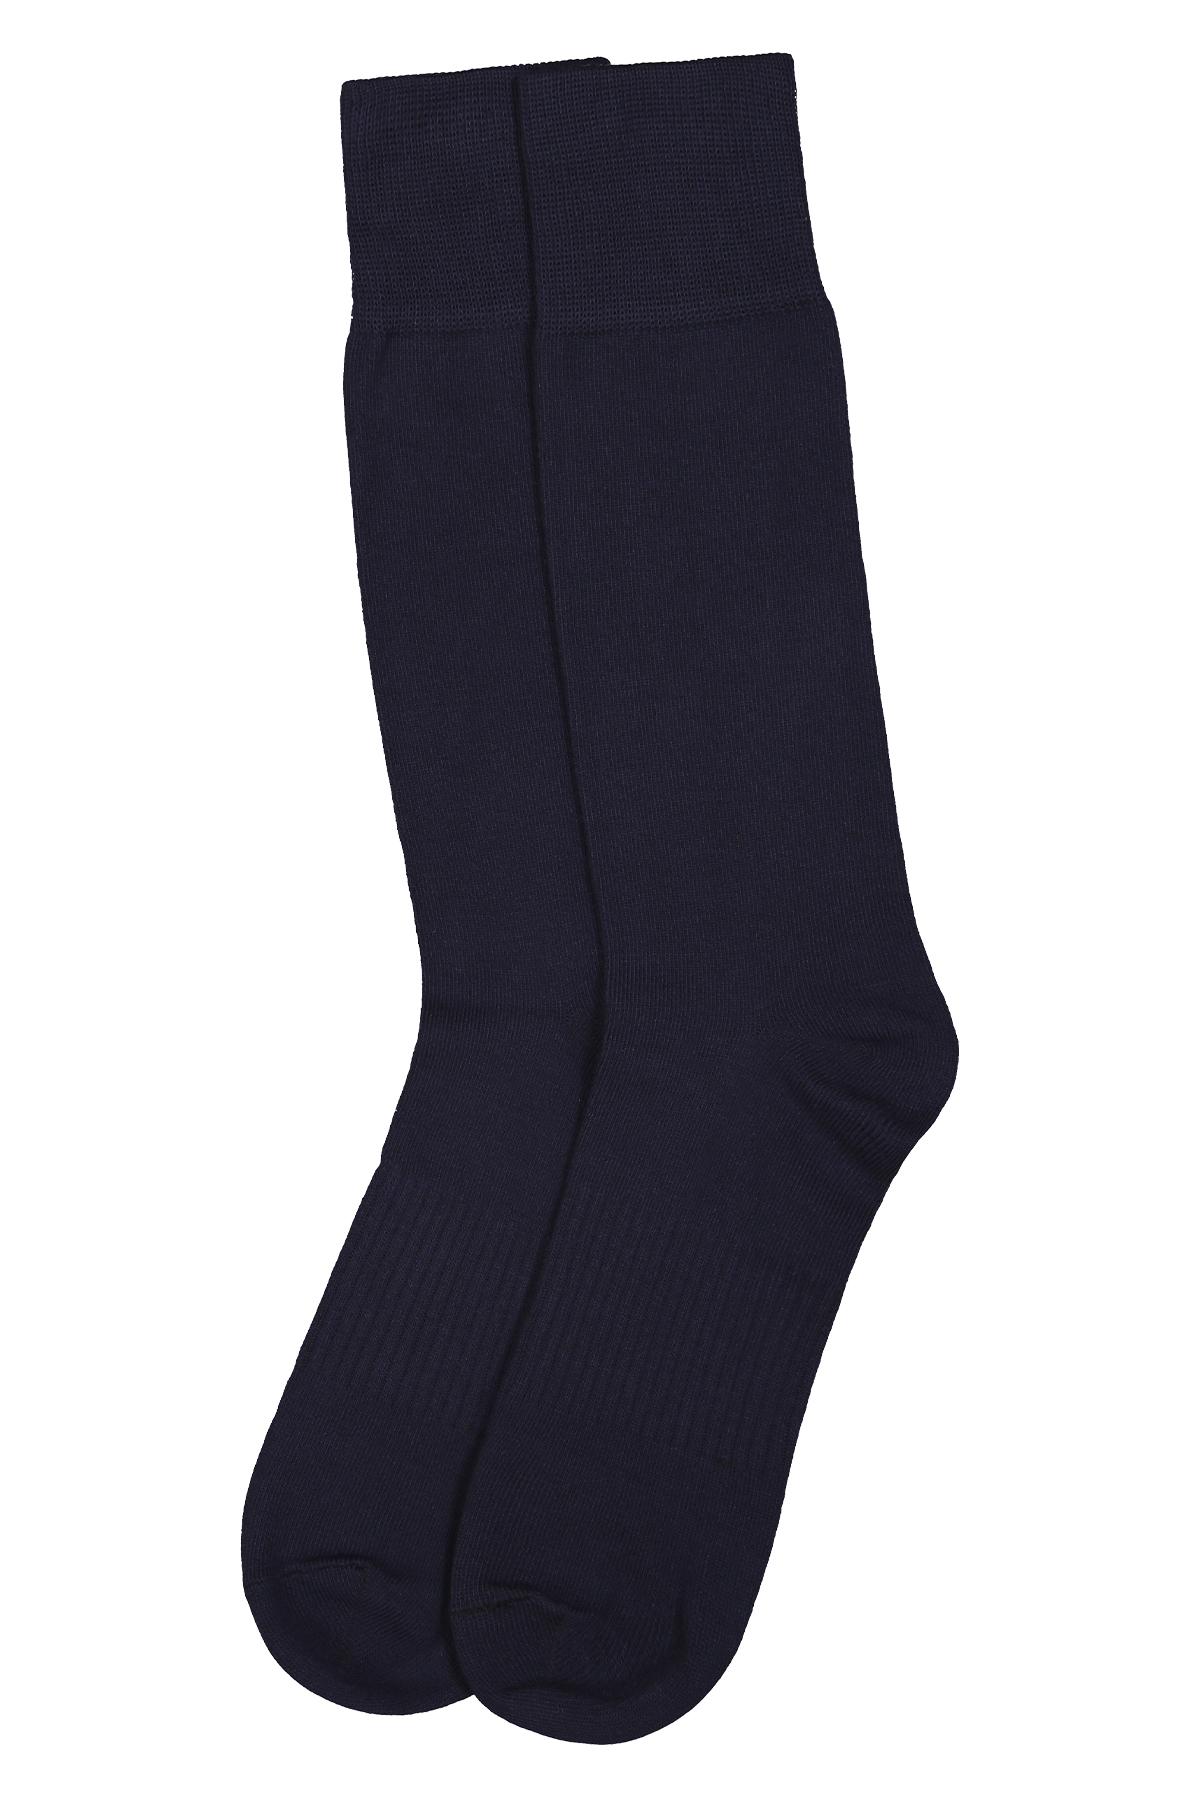 Calcetines marca Robert´s  color azul marino